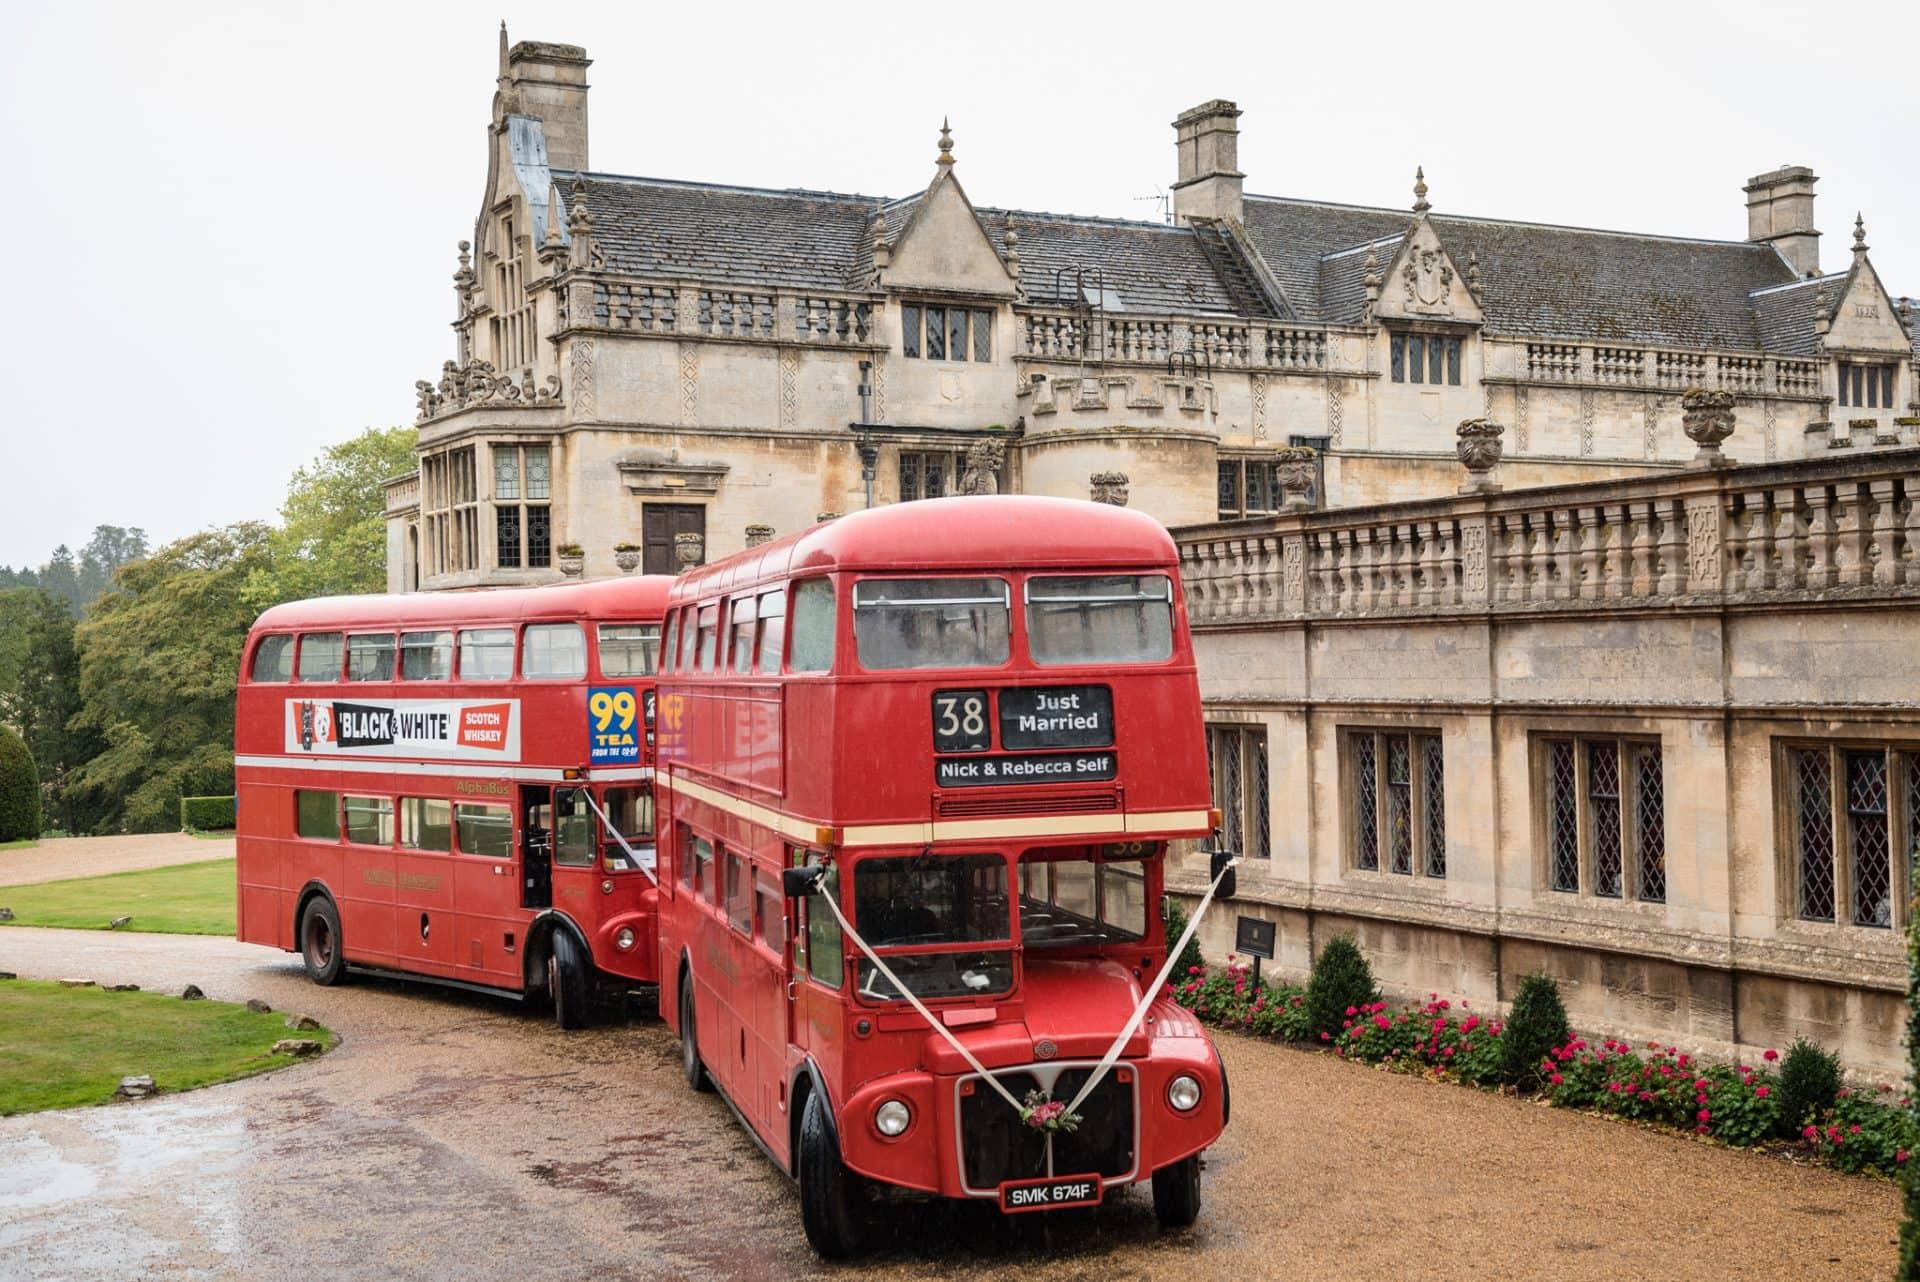 Red London bus at a wedding at Rushton Hall